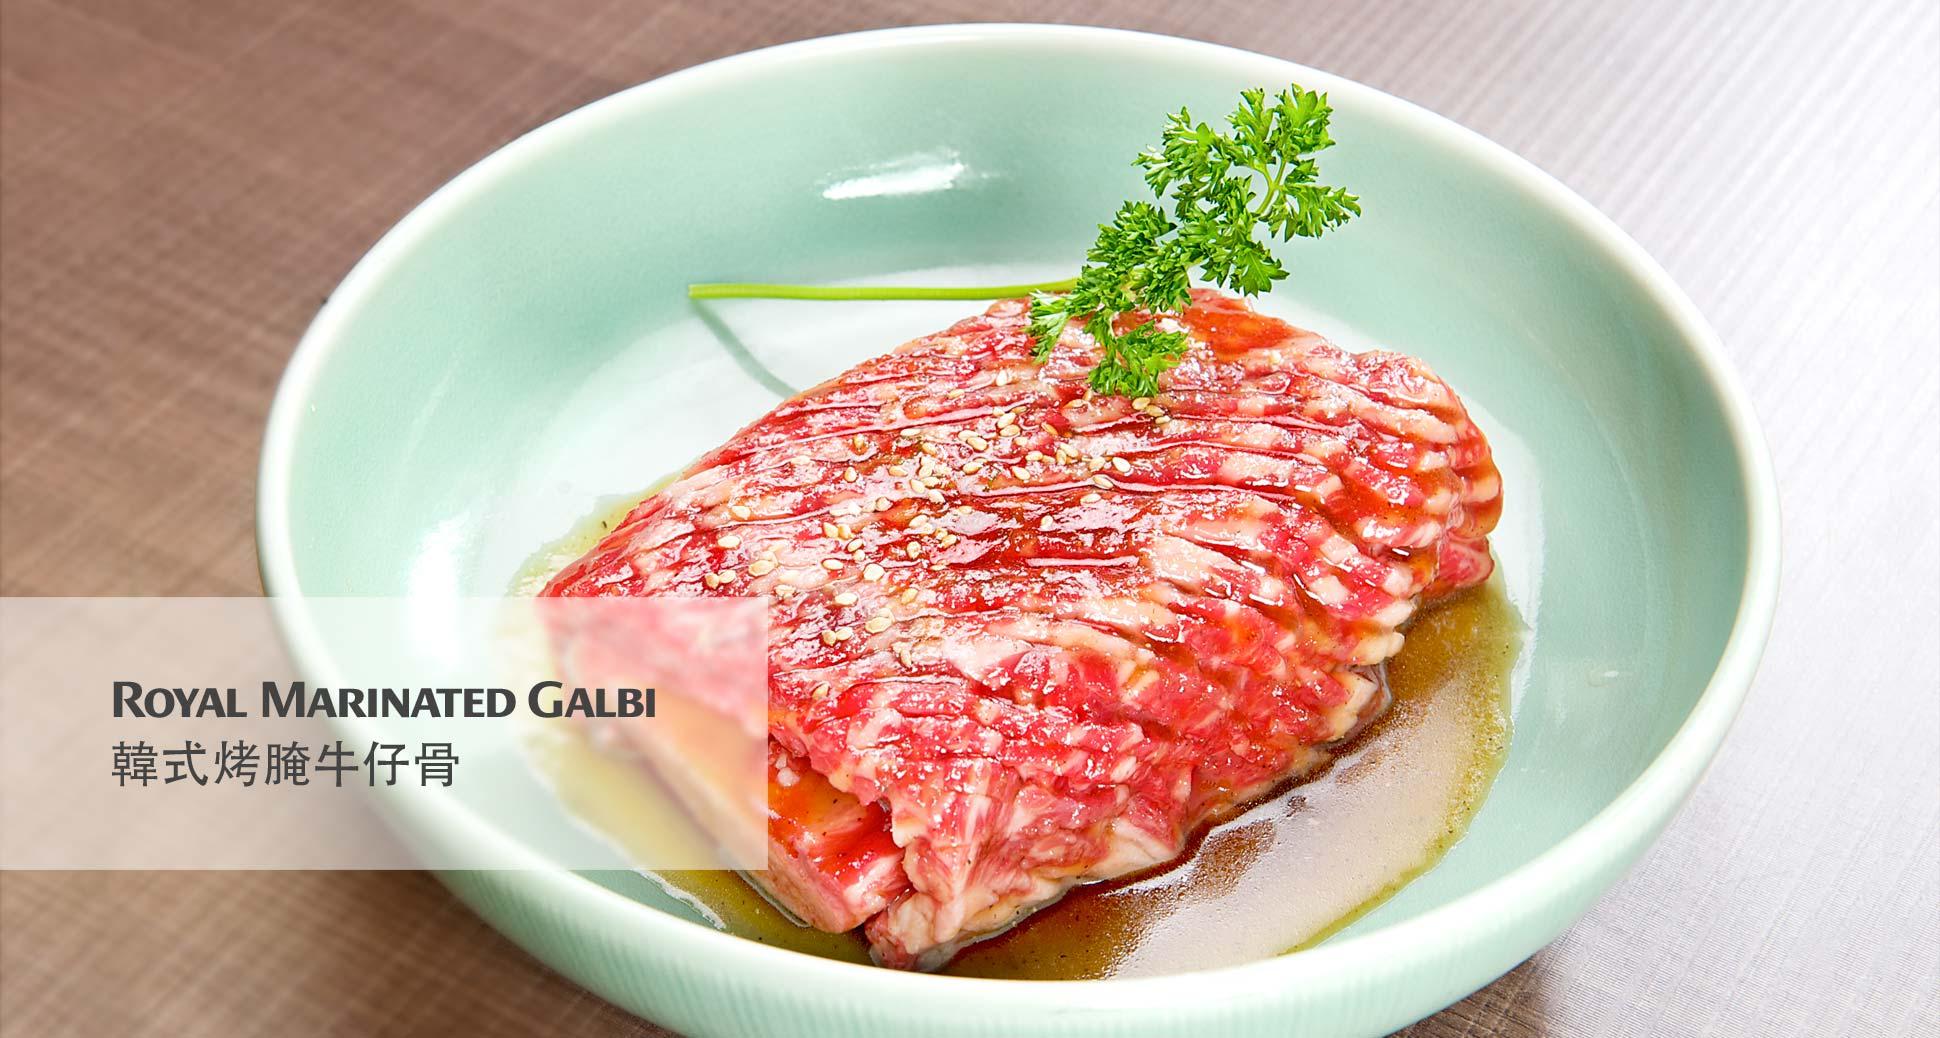 Another top 5 Korean menu you must try at sura korean bbq richmond